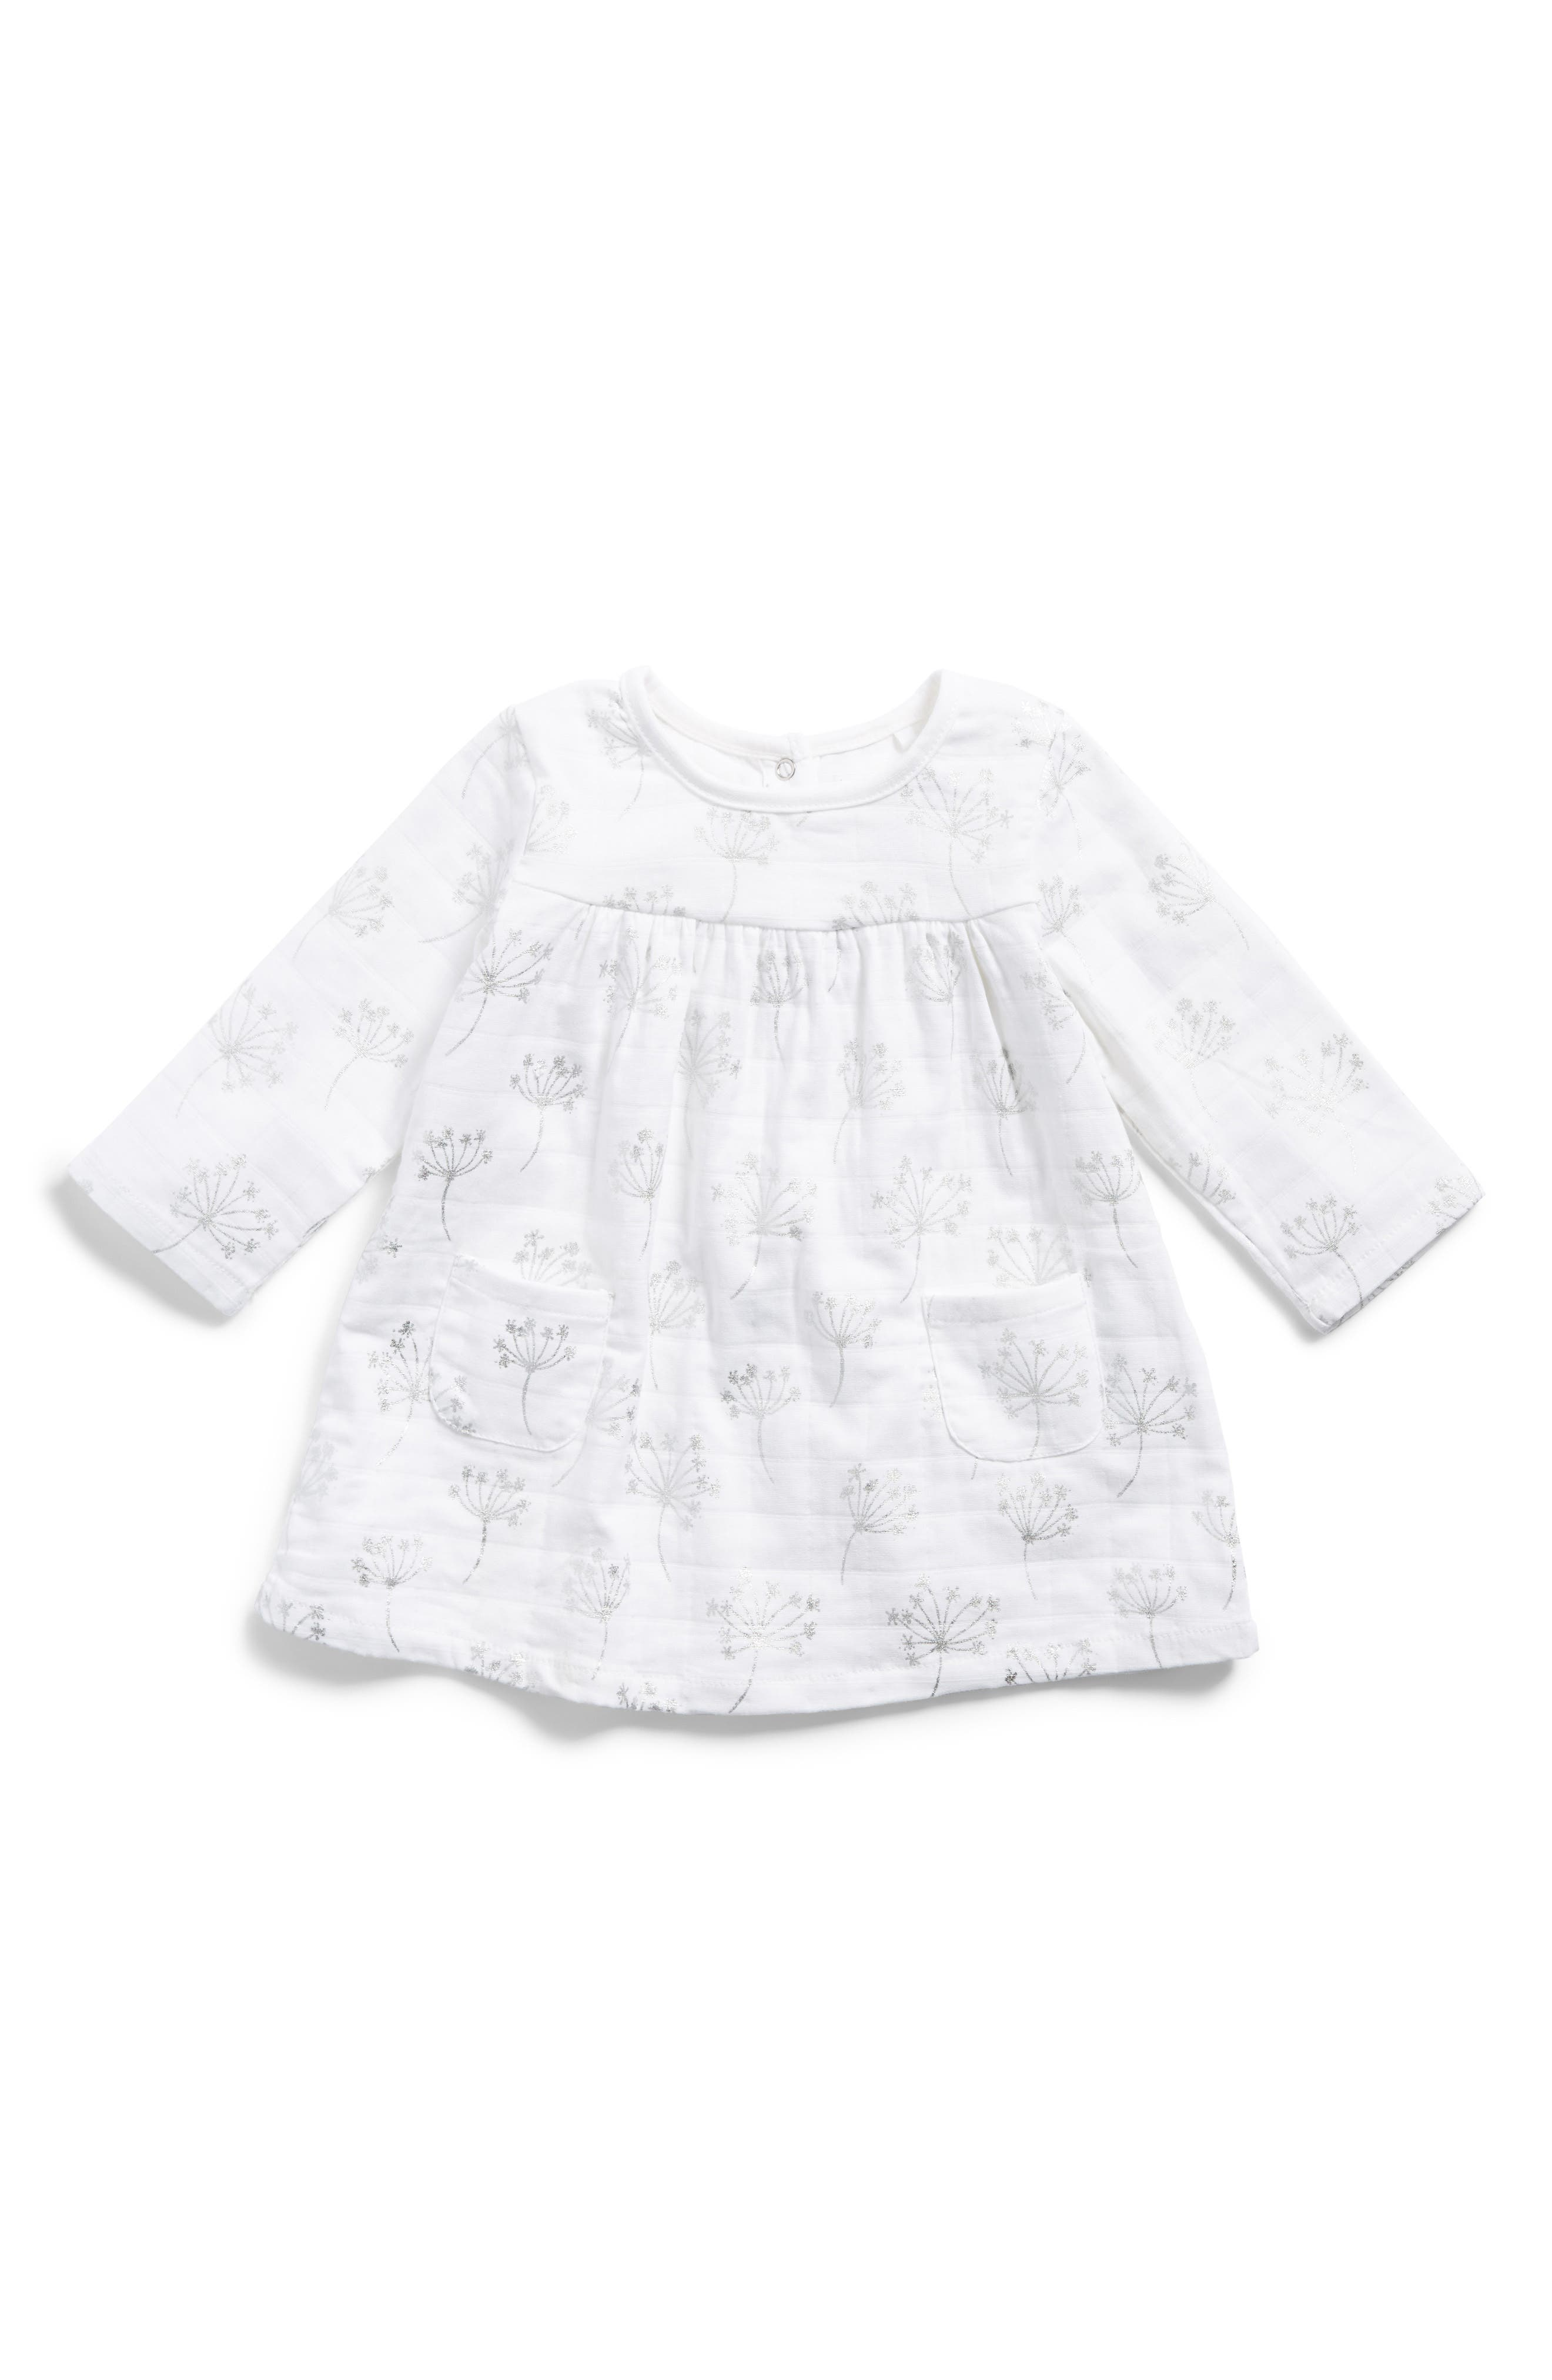 Main Image - aden + anais Pocket Dress (Baby Girls)